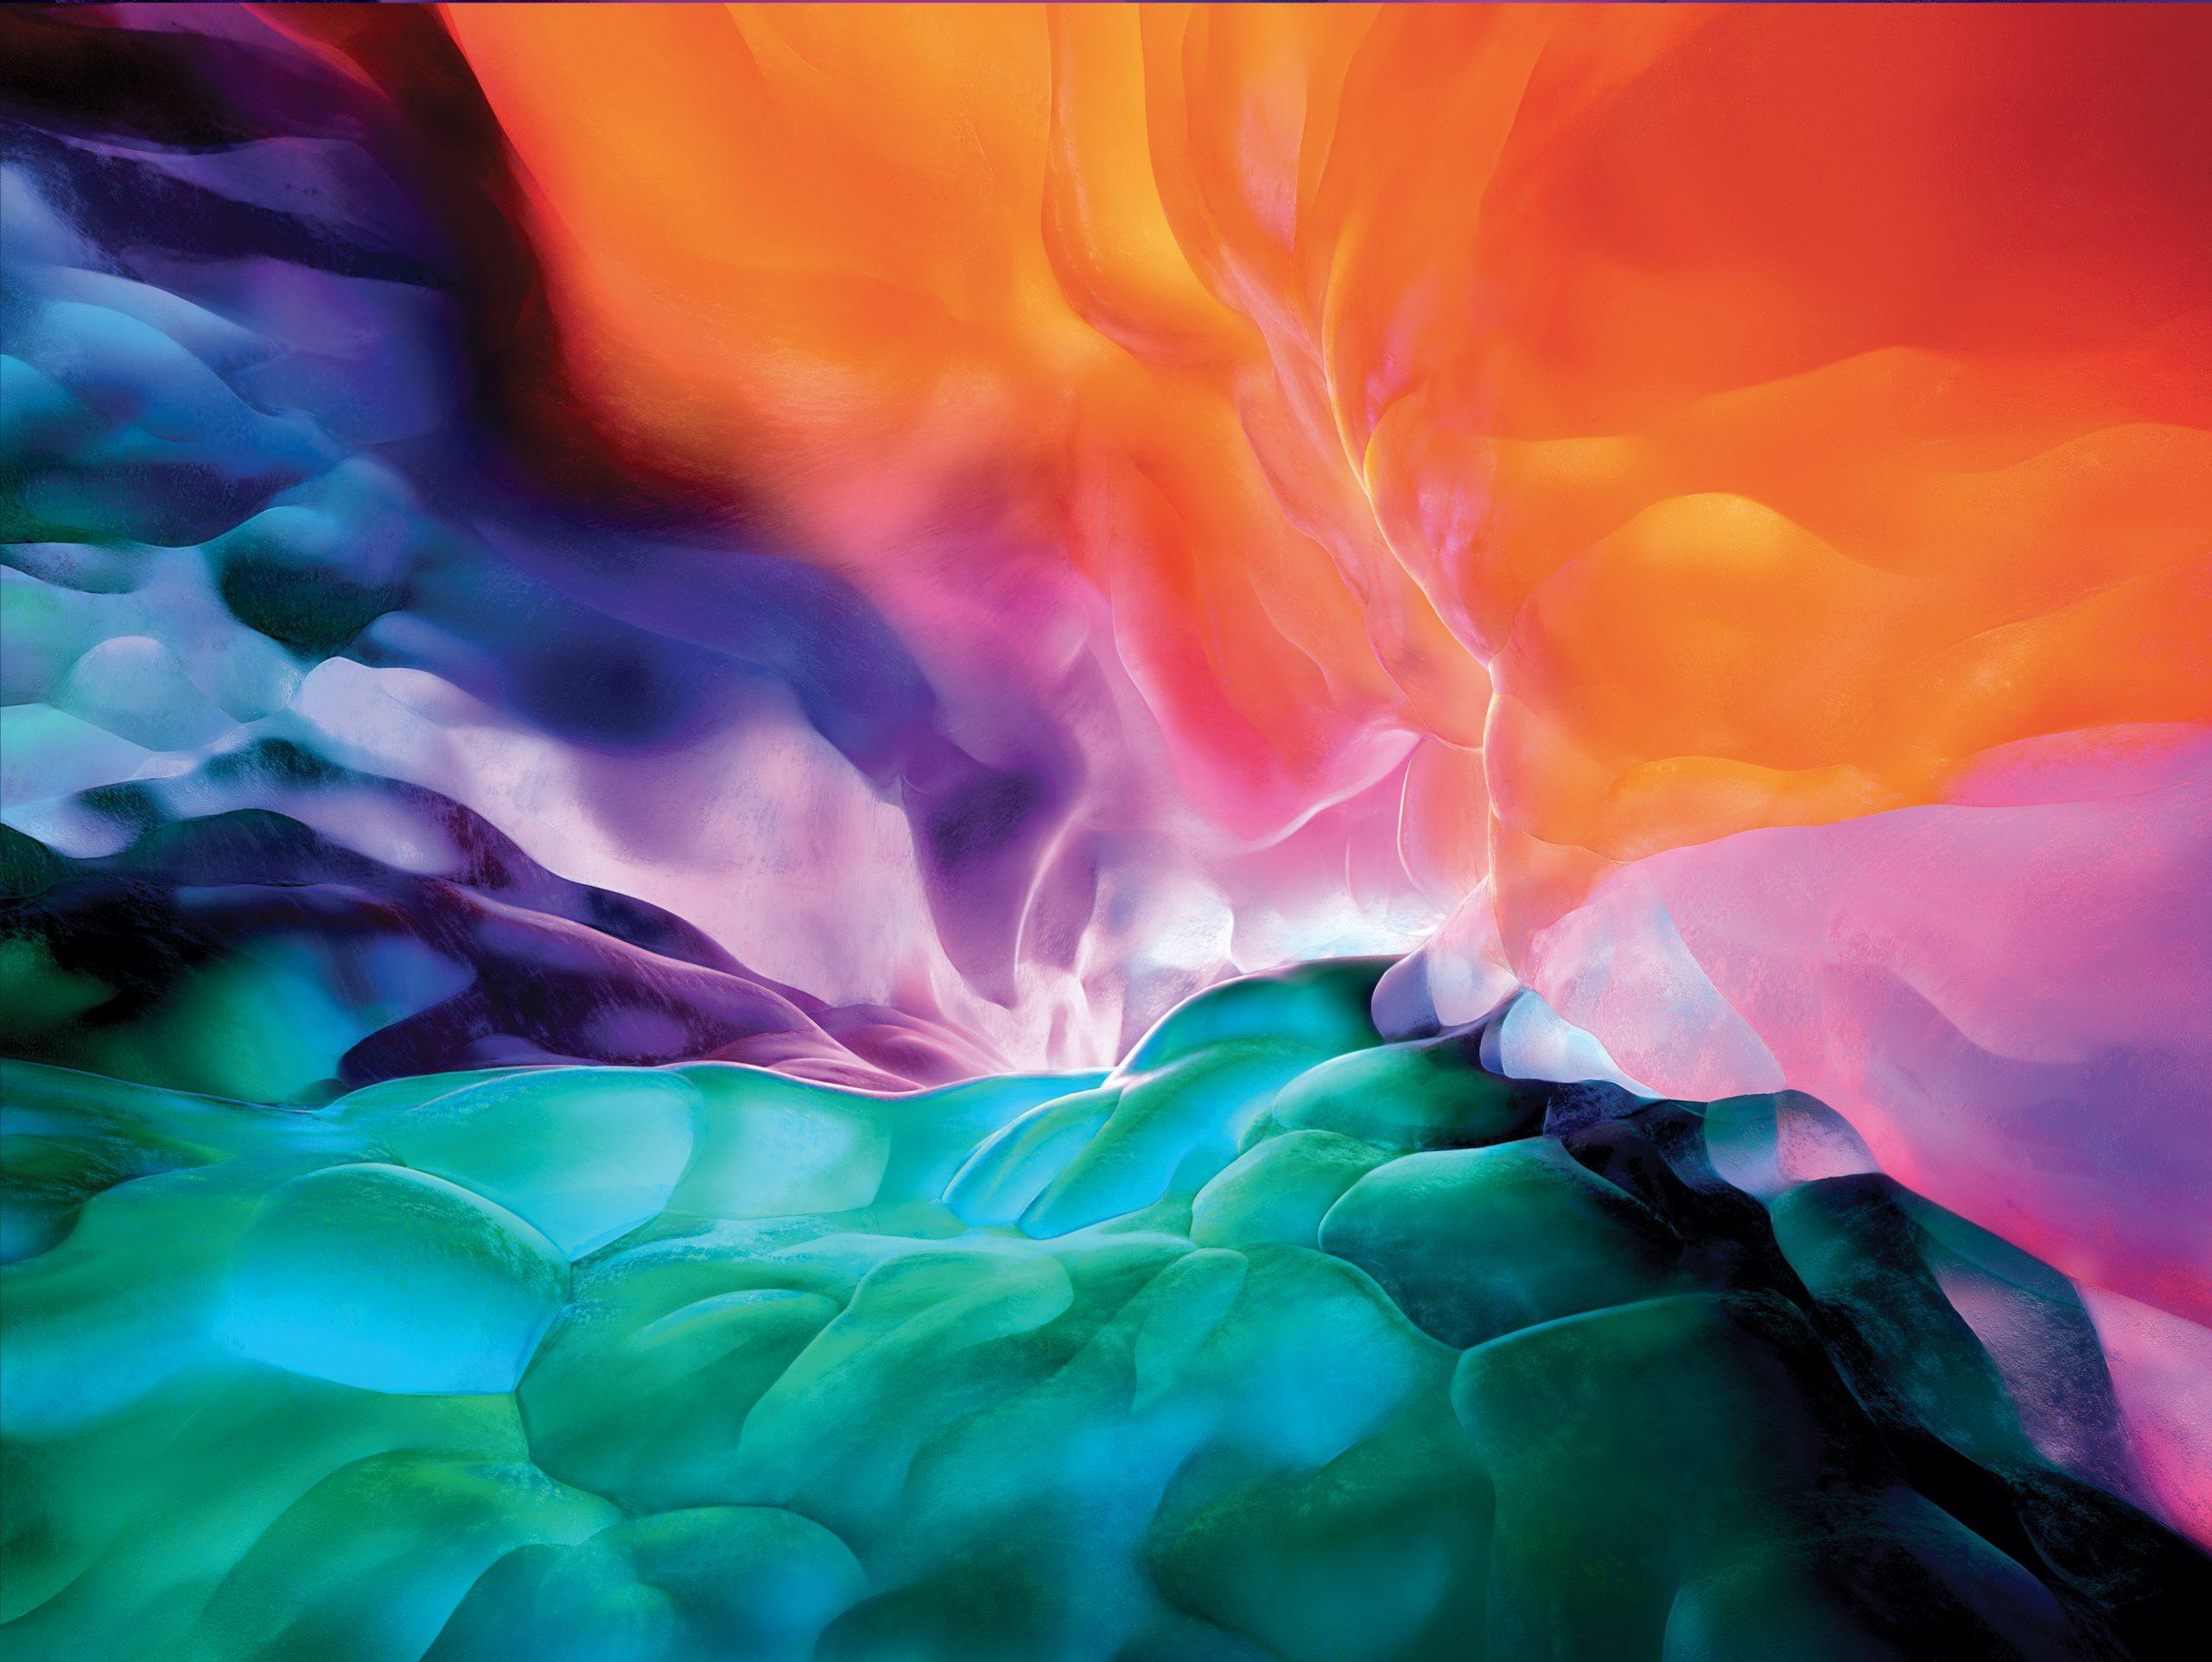 Ipad Pro Wallpaper   KoLPaPer   Awesome HD Wallpapers 2560x1923